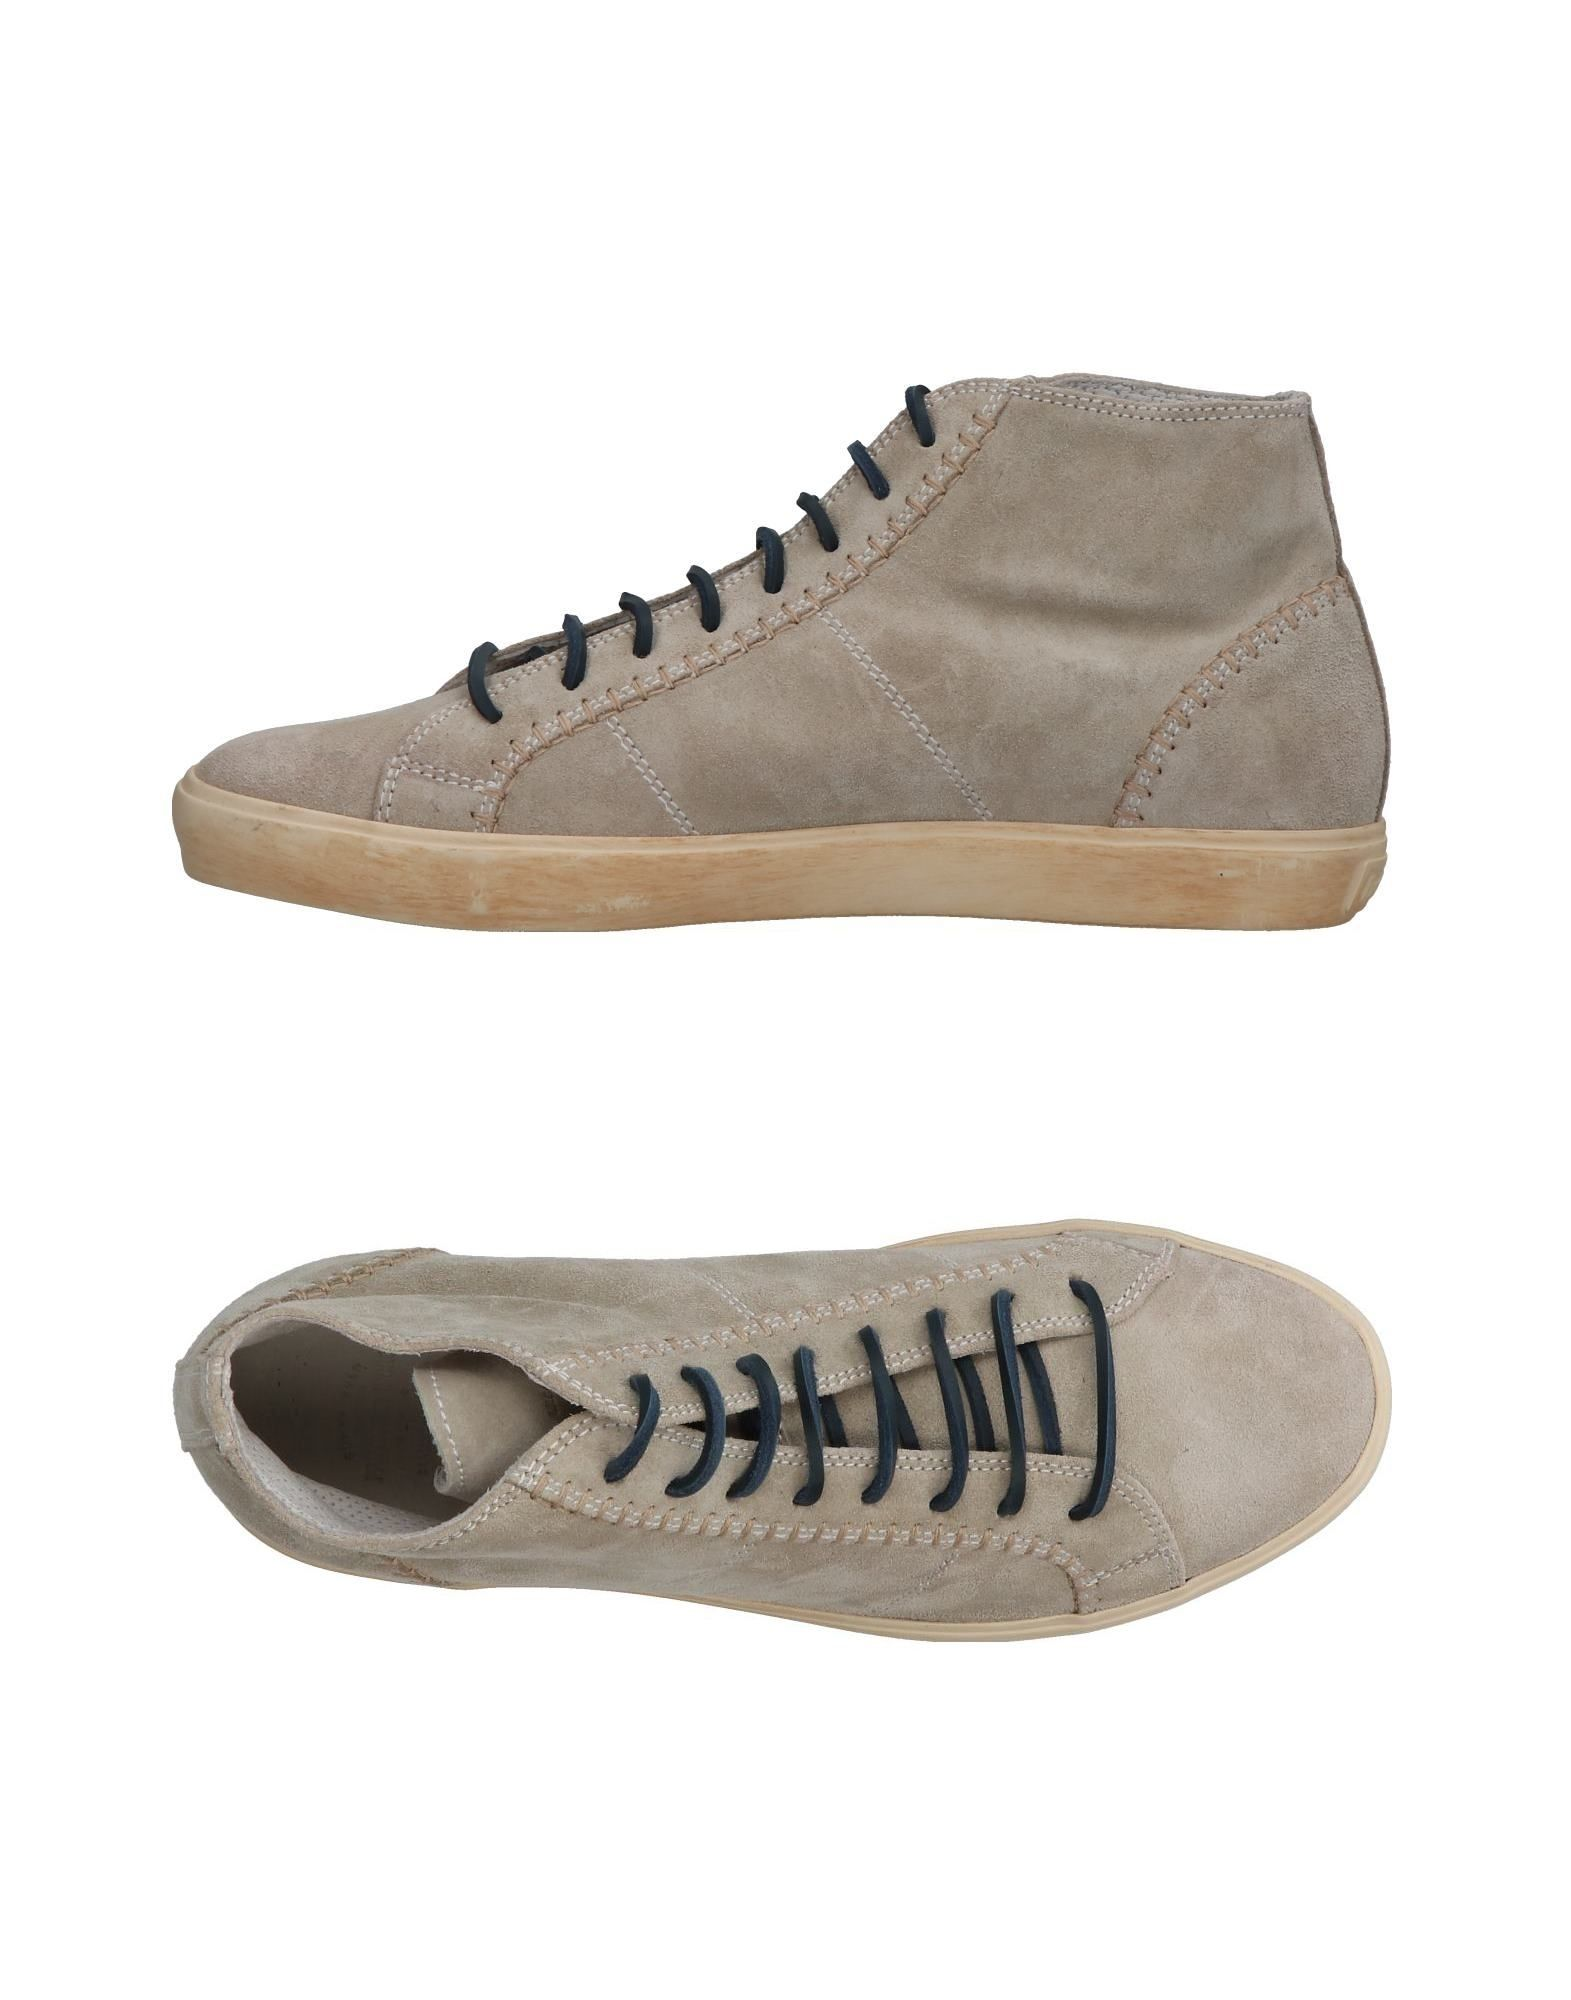 Pantofola D'oro Sneakers Herren  11353810XD Neue Schuhe